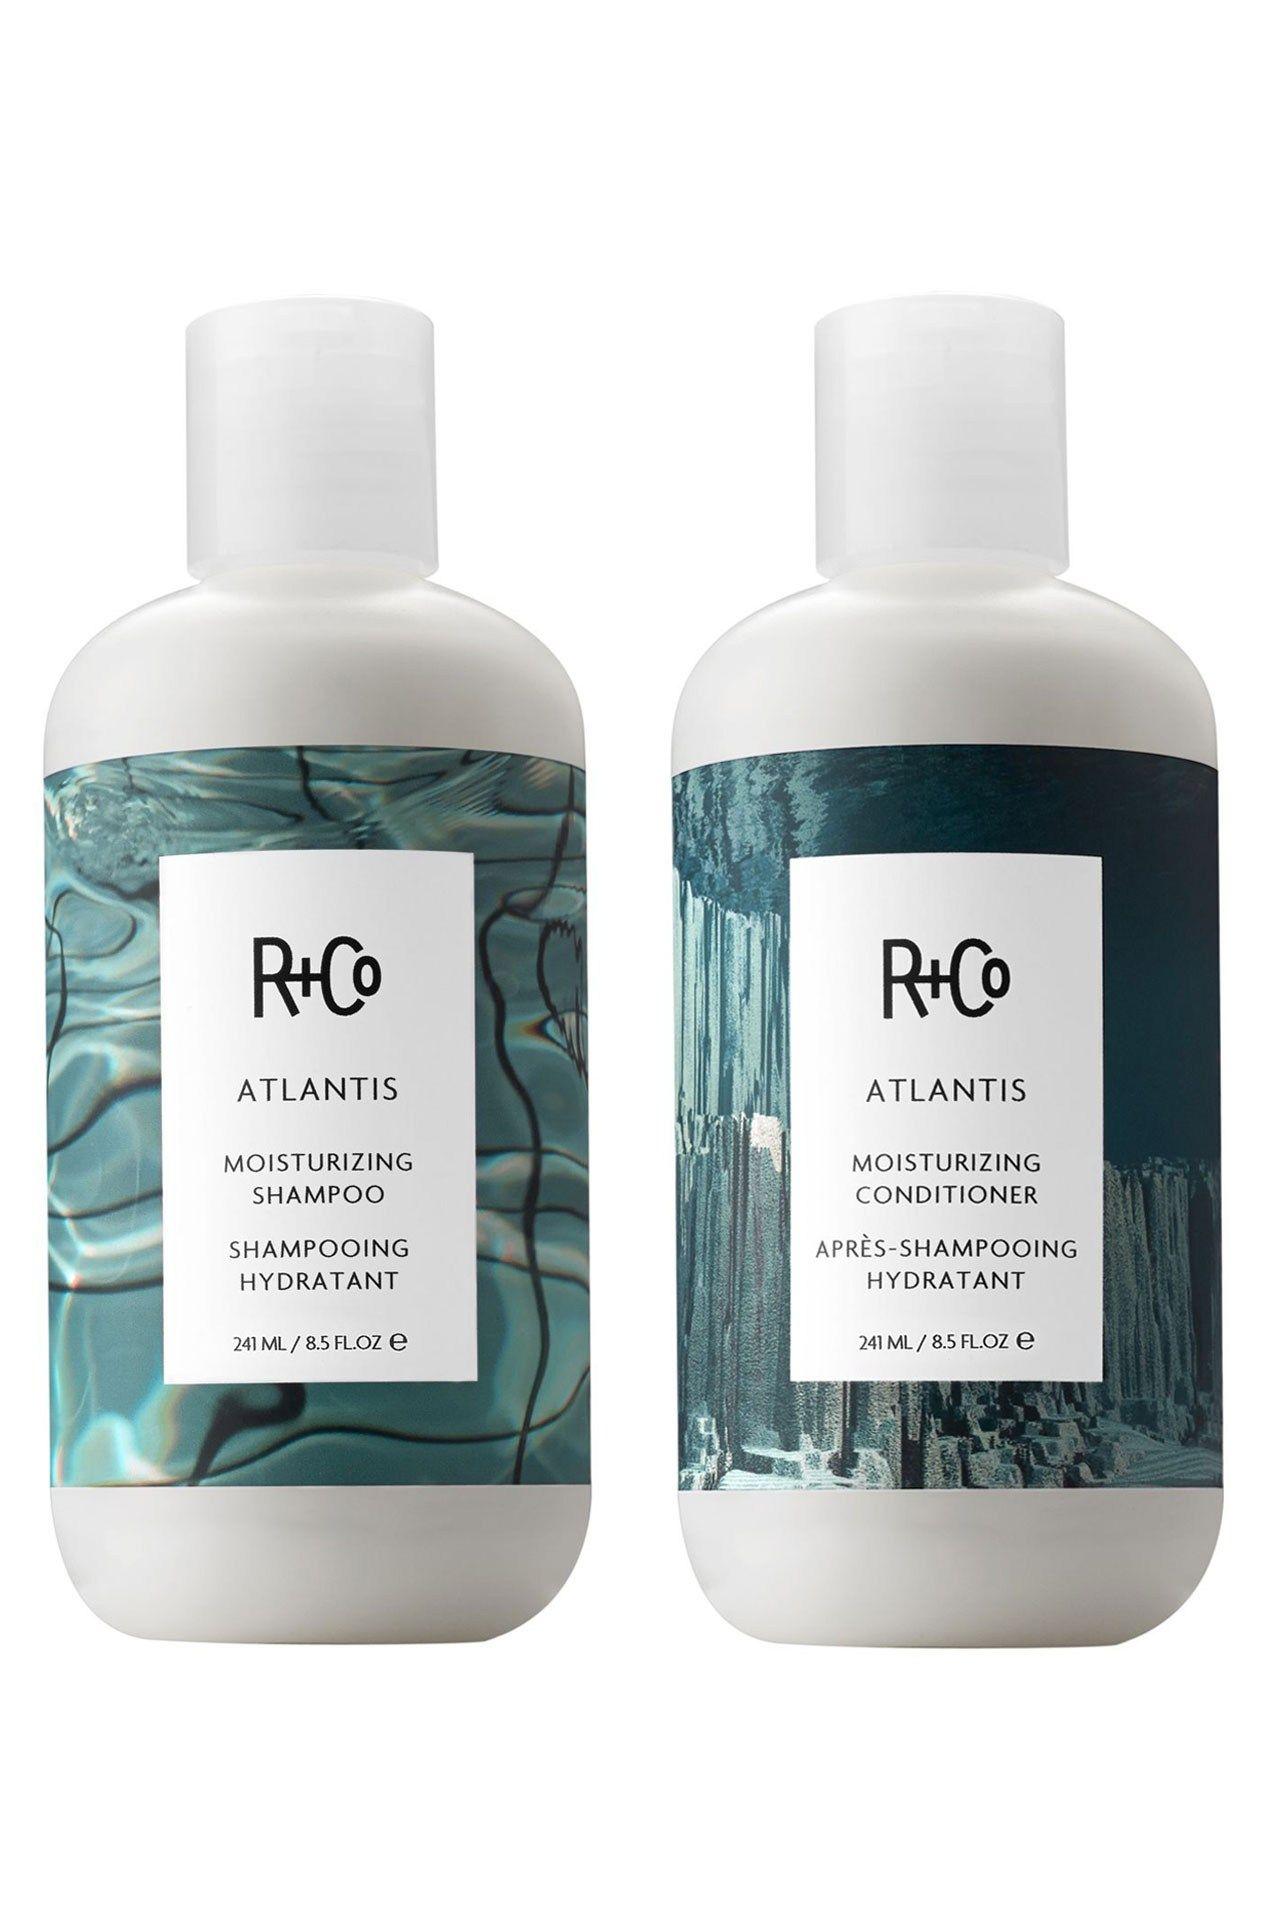 Simple Things Moisturizing shampoo, Skincare packaging